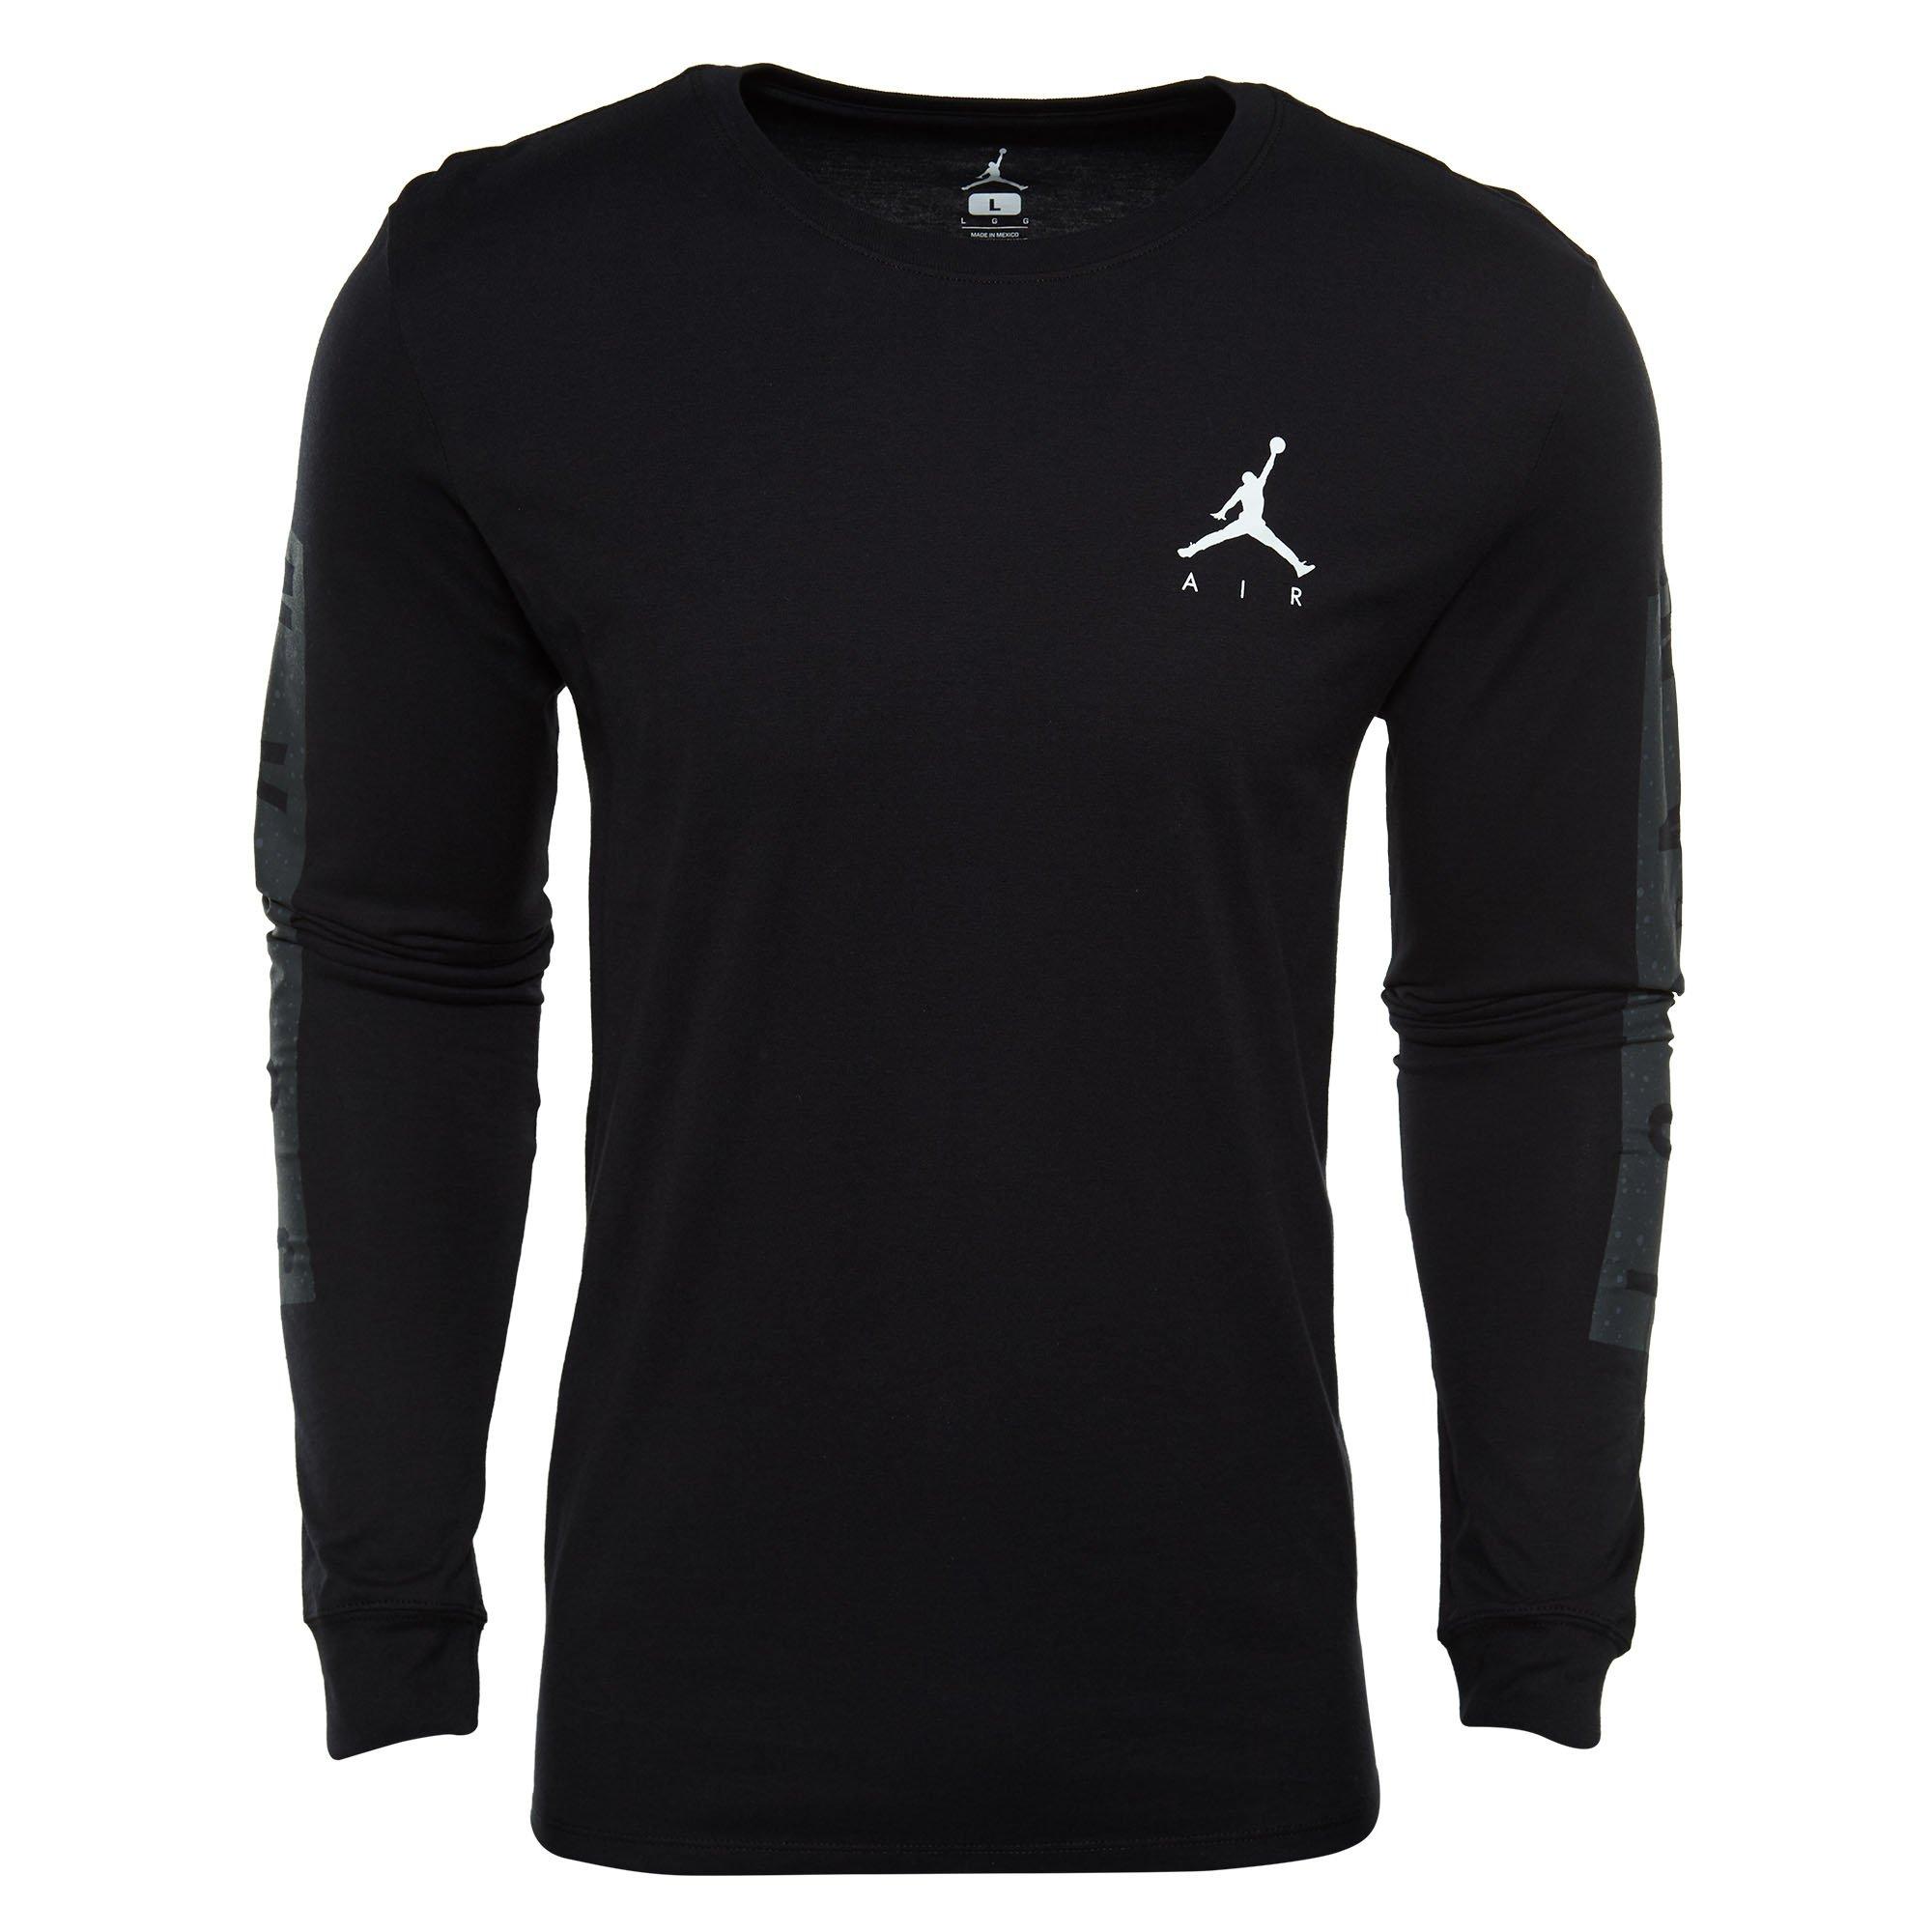 099b5169edd1 Galleon - Nike Mens Air Jordan Cement Print Long Sleeve T-Shirt  Black Anthracite AA3268-010 Size X-Large